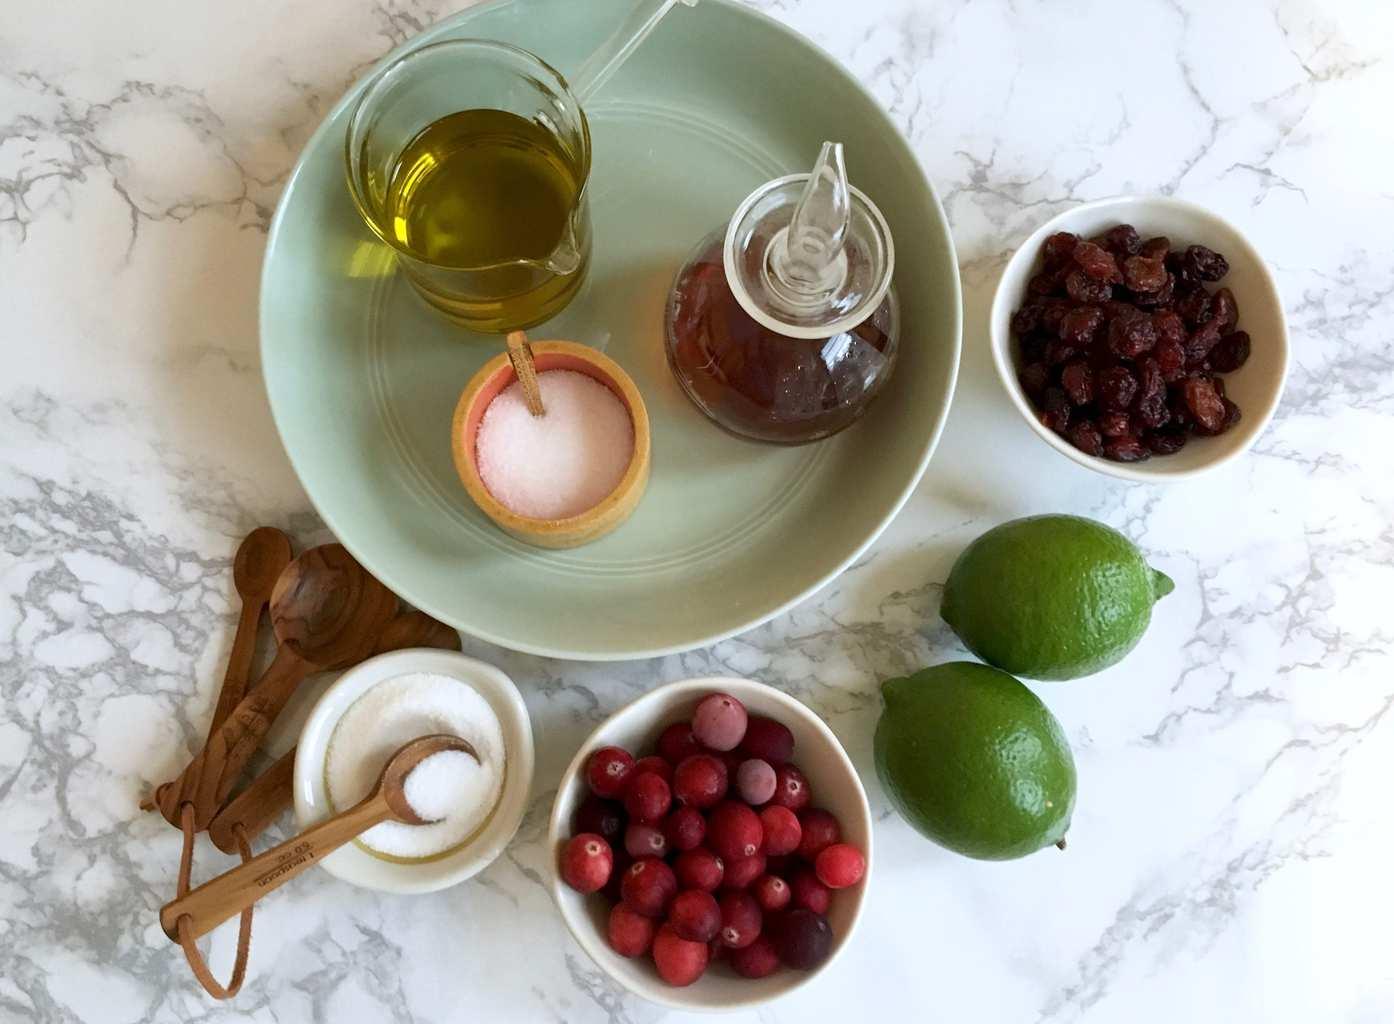 ingredients for cranberry vinaigrette